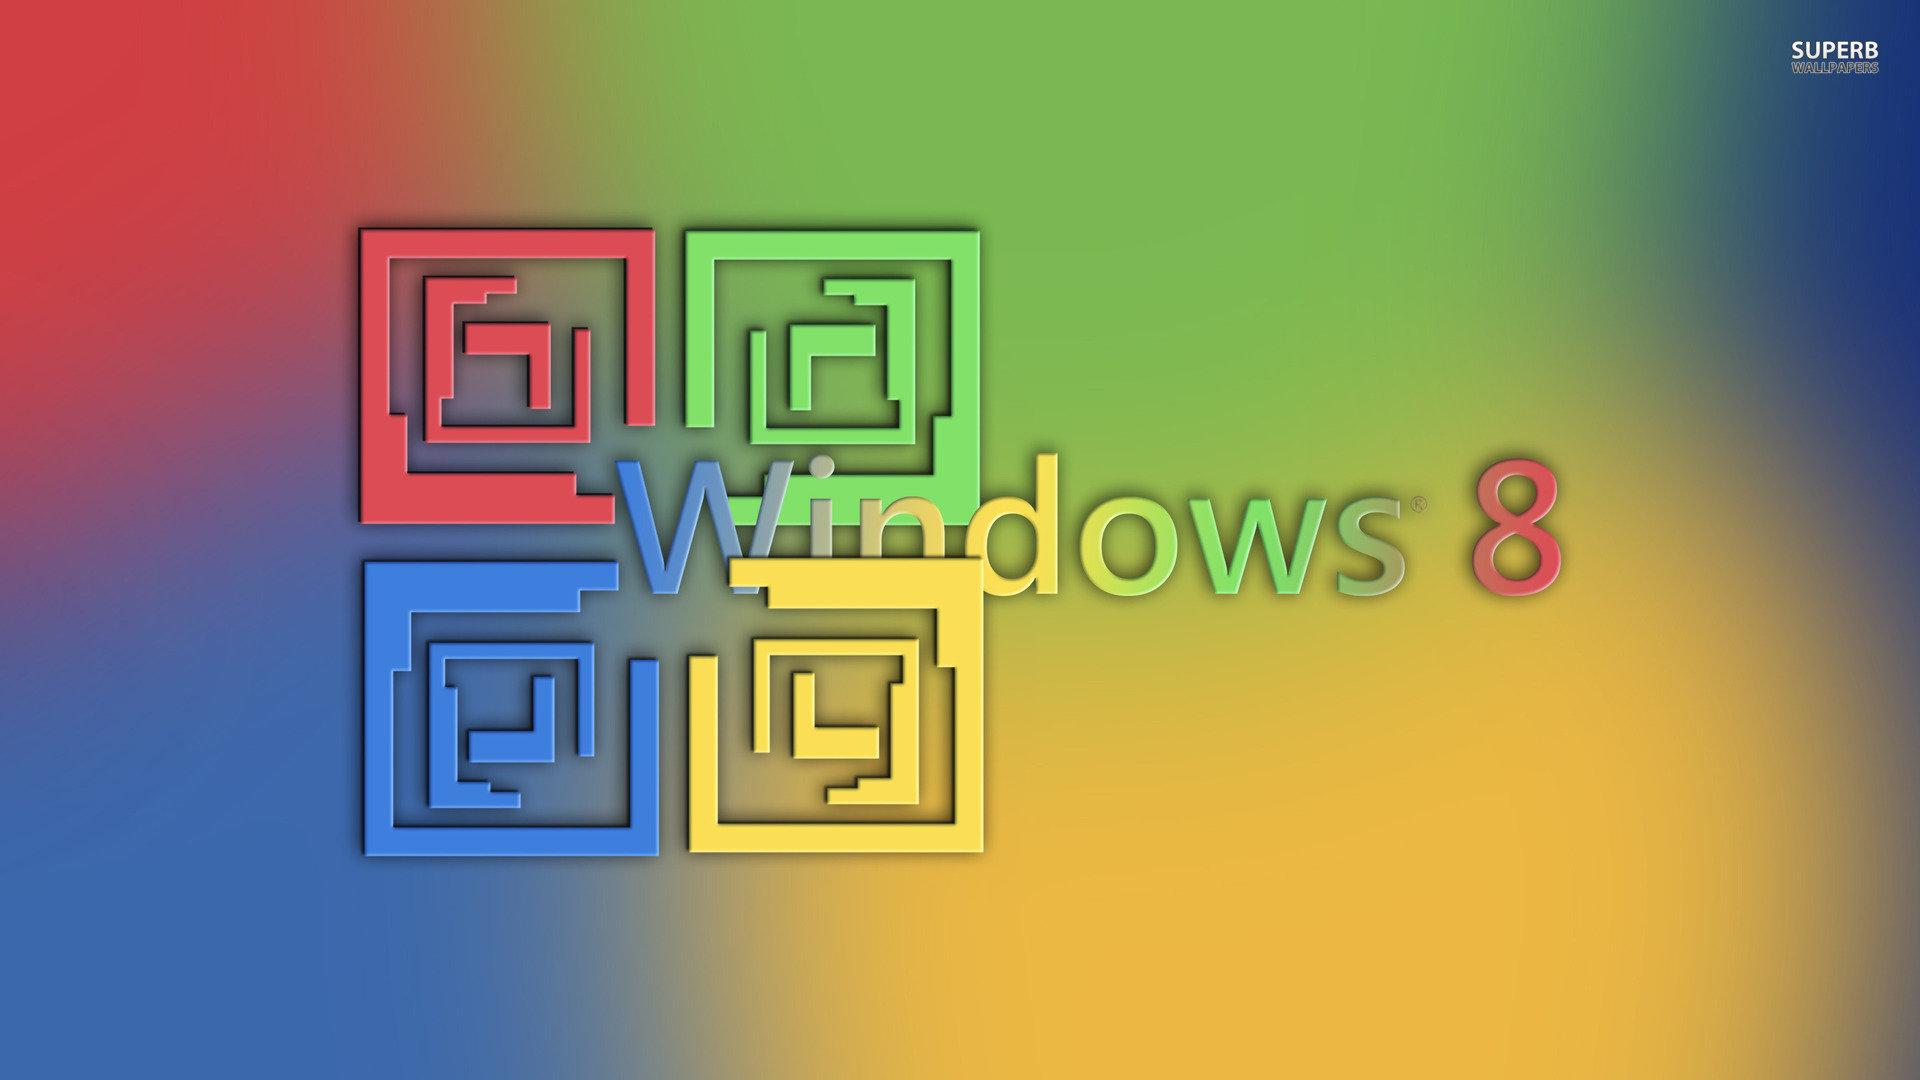 Best Windows 8 Wallpaper Id - Microsoft Logo Windows 8 Logo Hd - HD Wallpaper